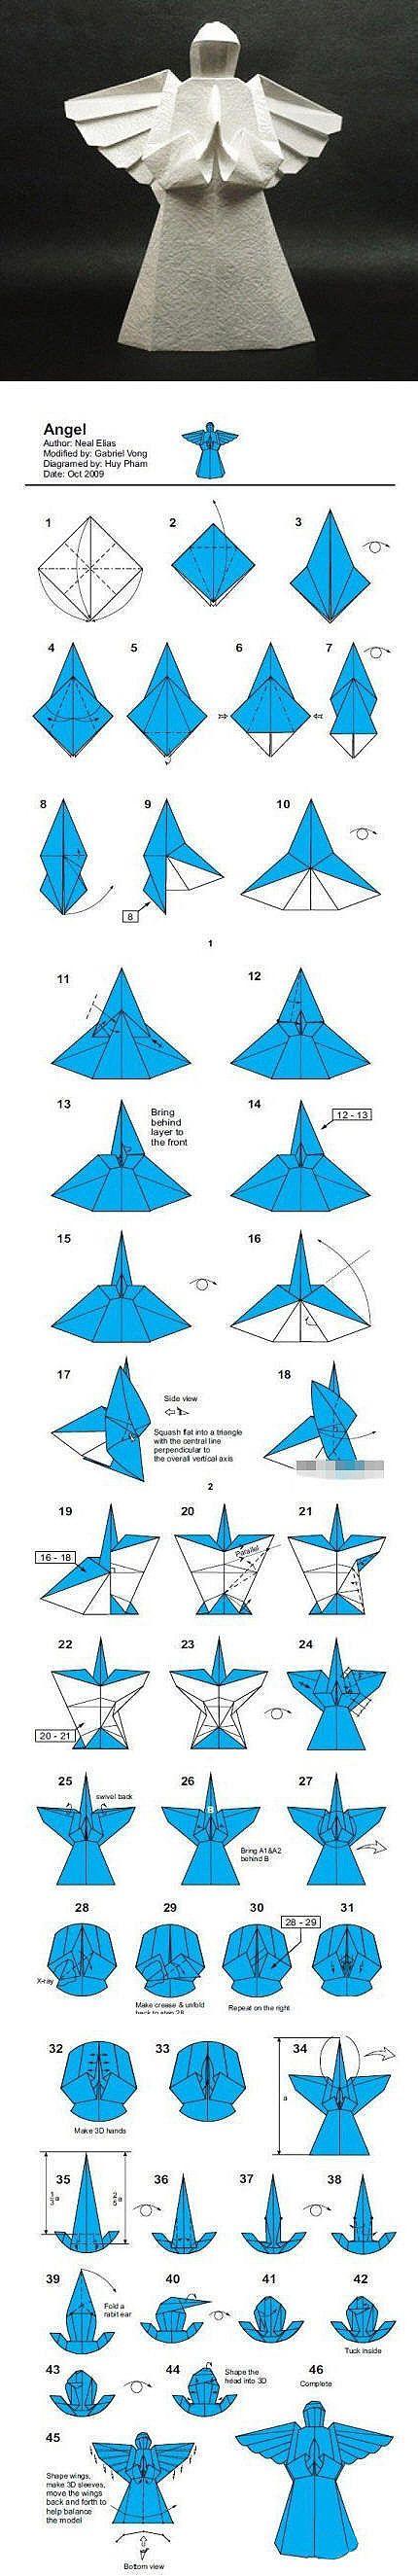 Let's Make DIY Origami Christmas Decorations Together ...